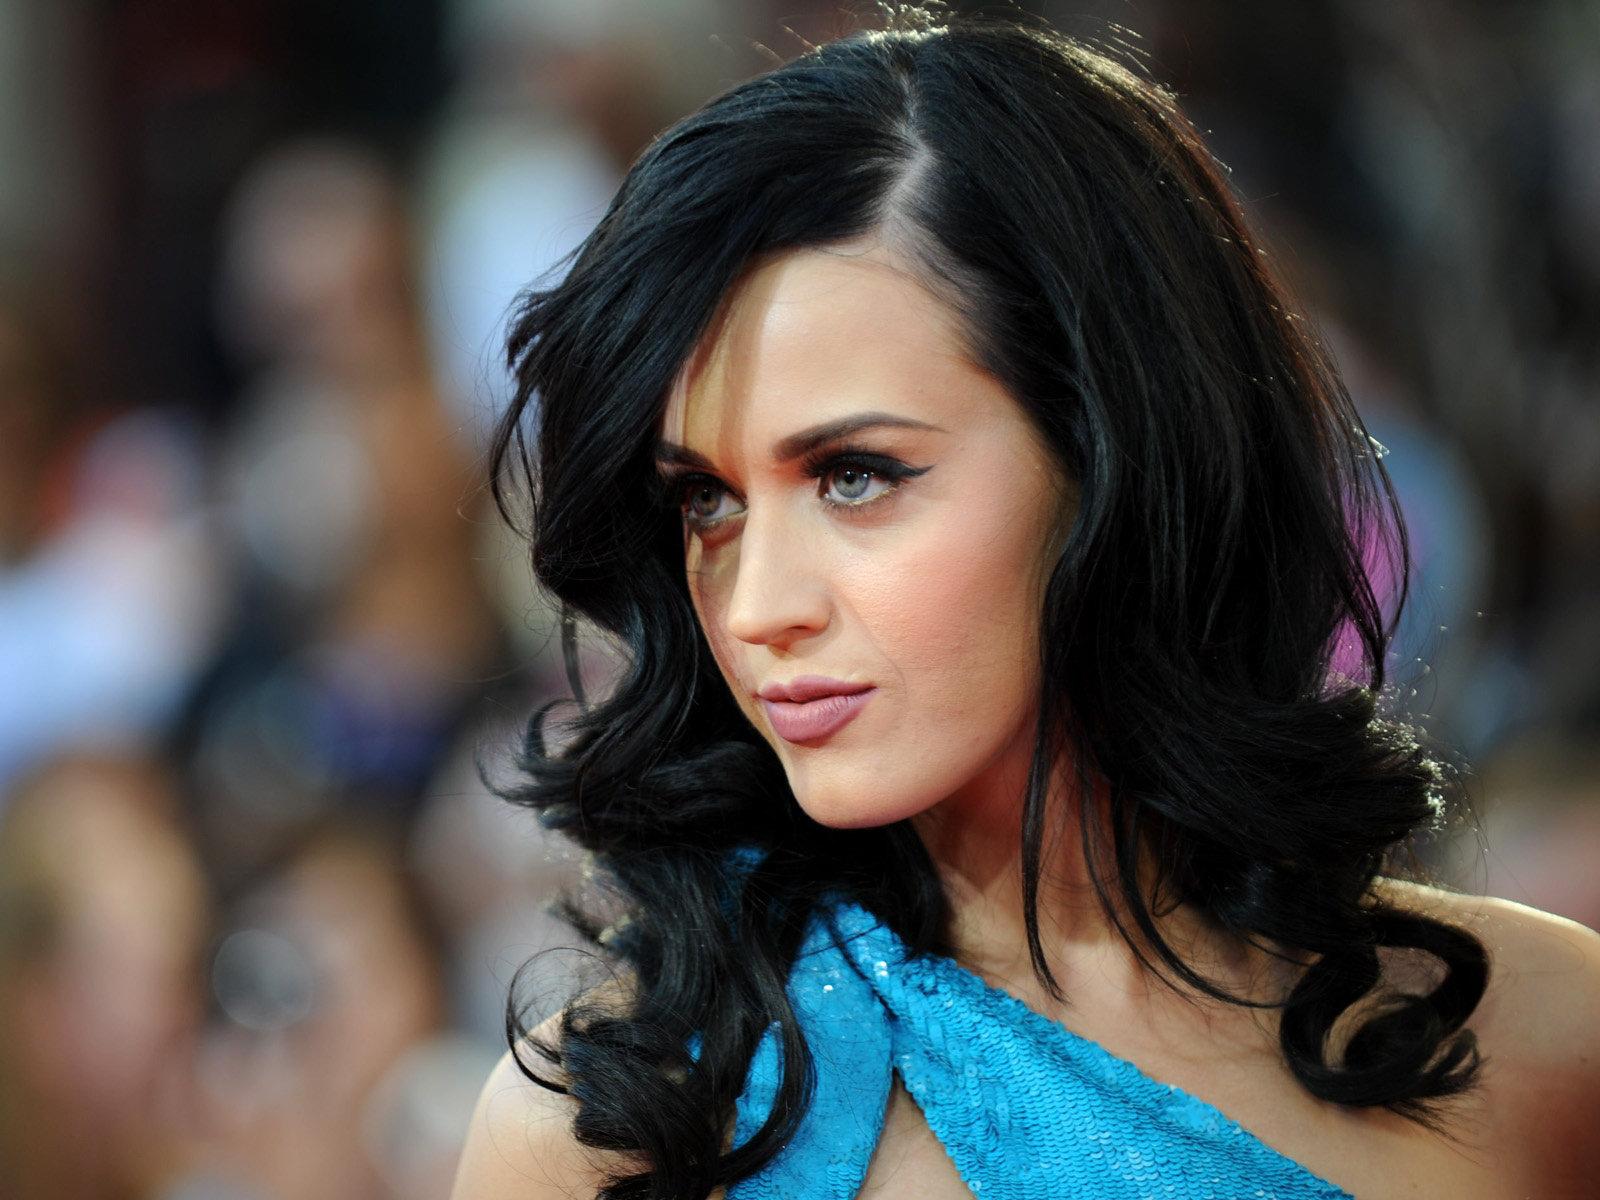 Plastic bag katy perry lyrics - Plastic Bag Katy Perry Lyrics 32